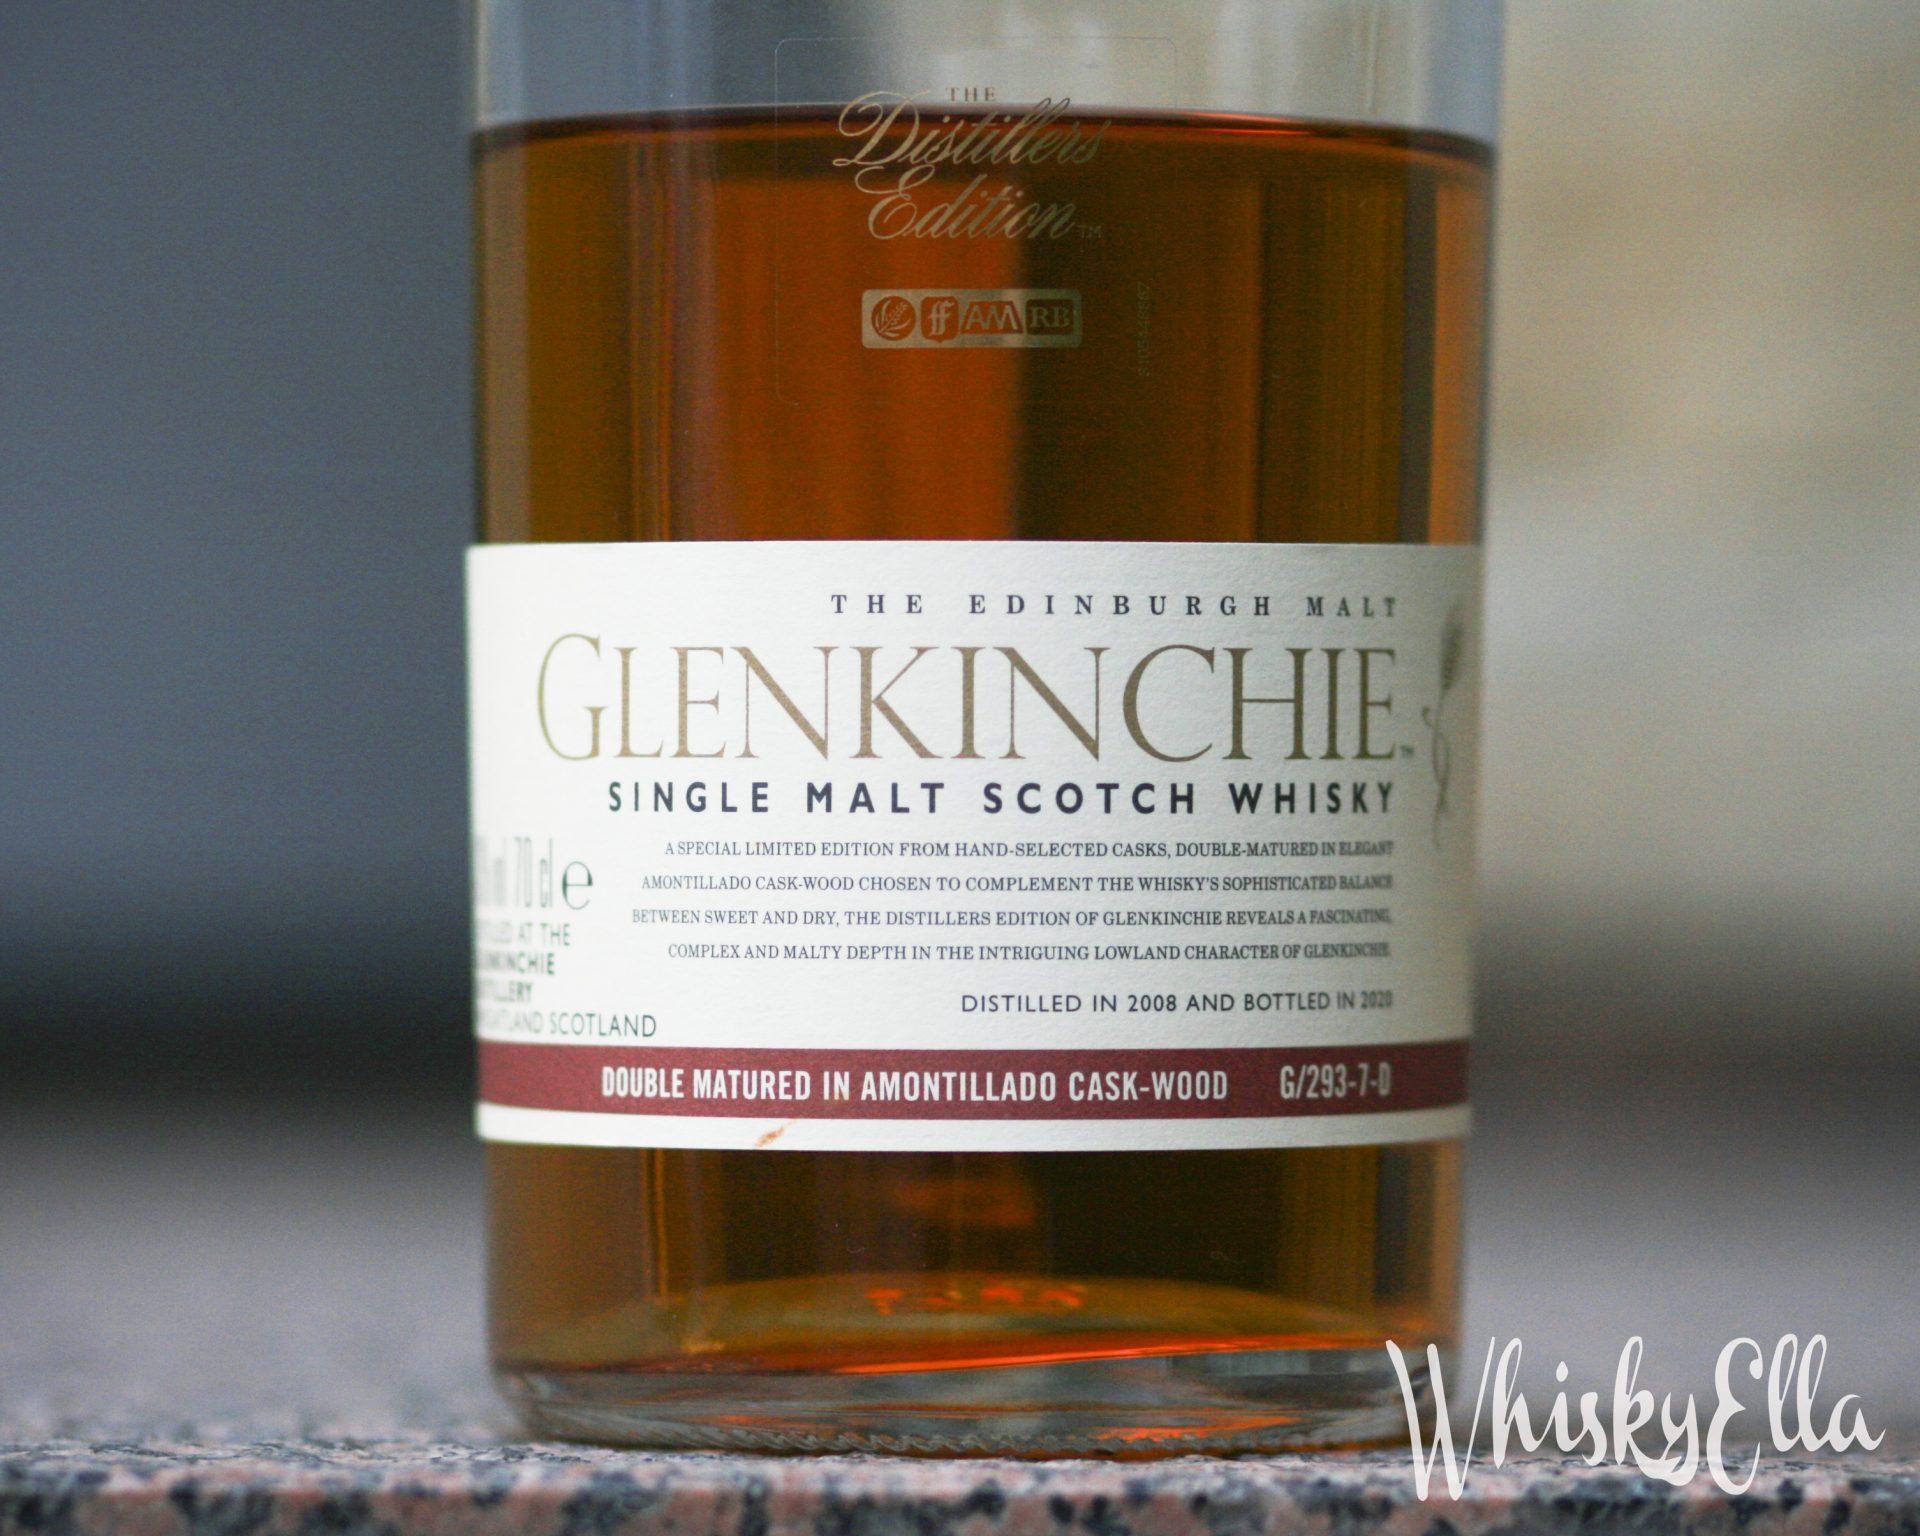 Nasza recenzja Glenkinchie Distillers Edition 2020 #99